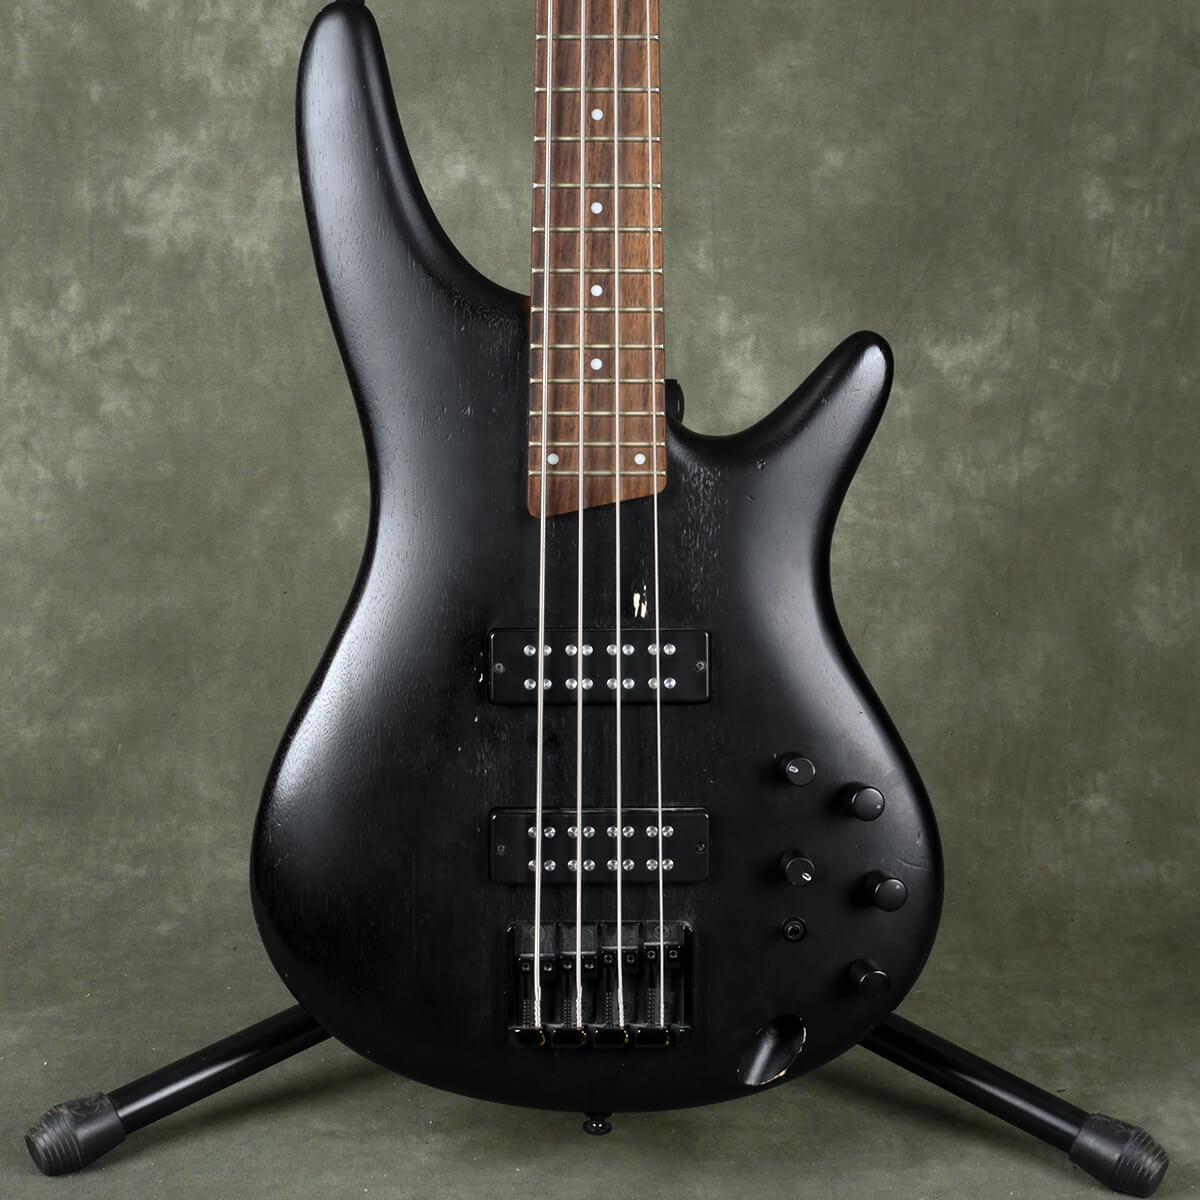 Ibanez SR300 EB Bass Guitar - Black - 2nd Hand